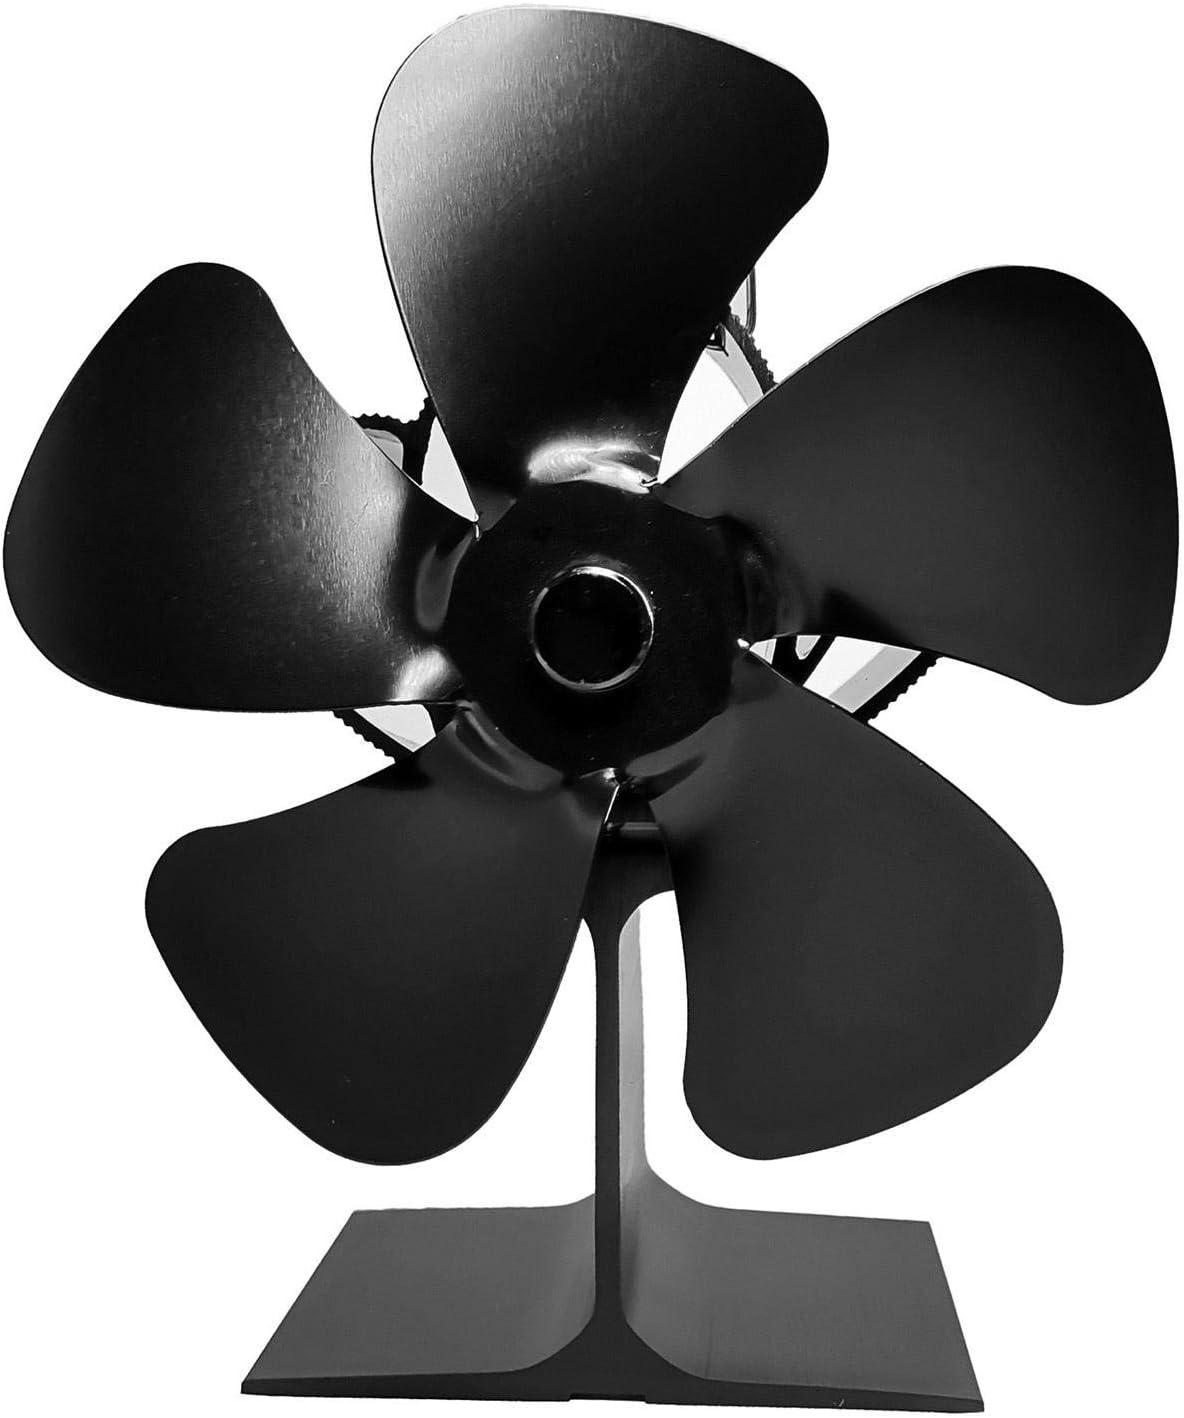 Fireplace Fan 5-blade Quiet Safe お得セット Sto 価格 Heat Powered